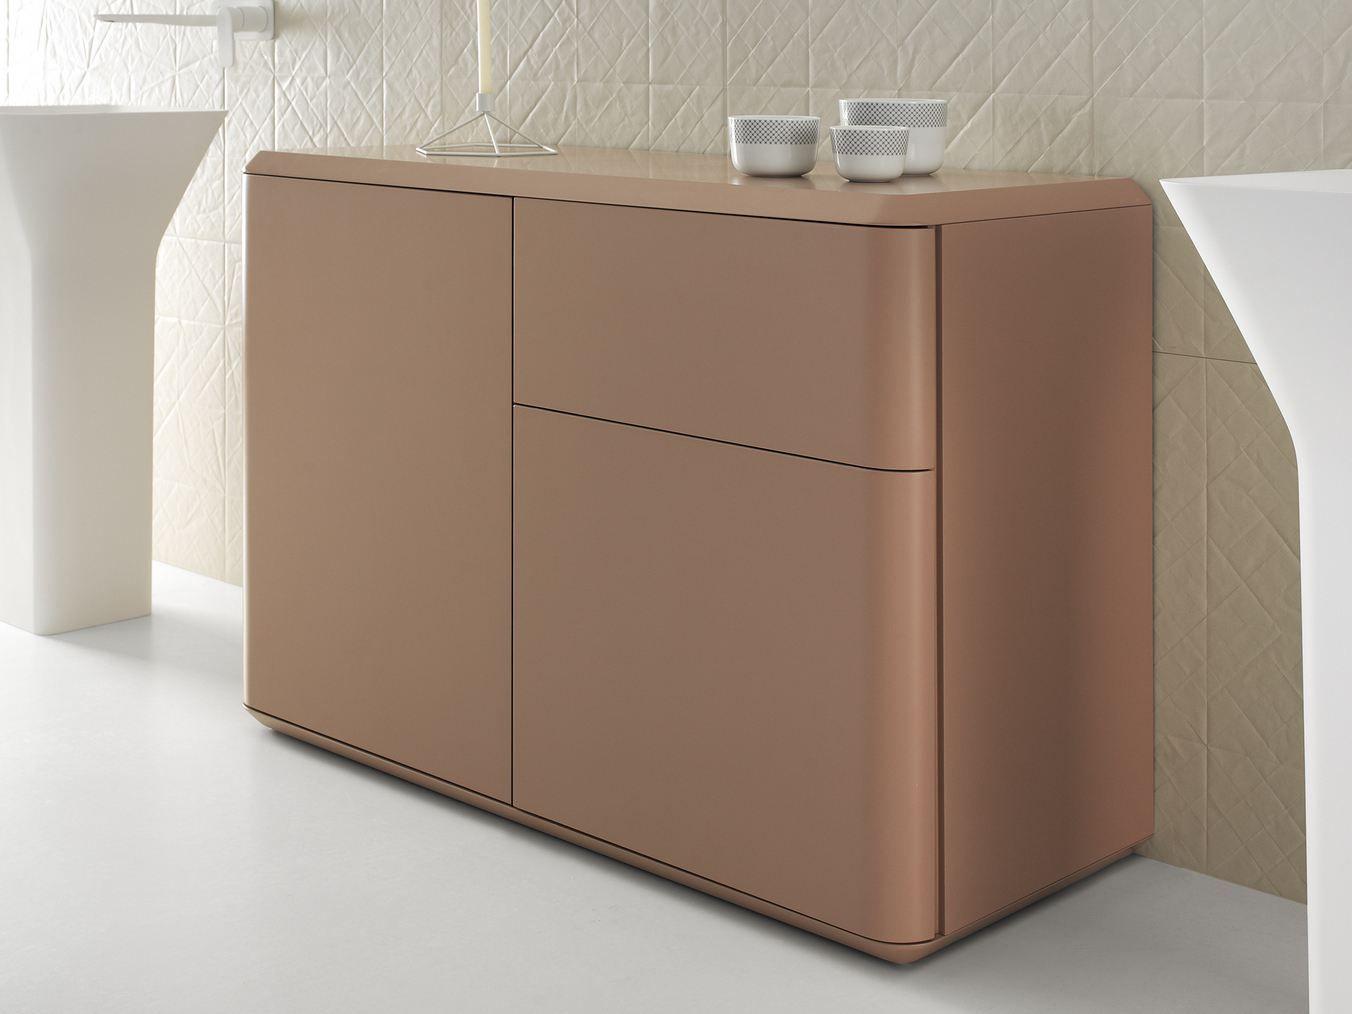 Fluent meuble pour salle de bain by inbani design arik levy for Meuble salle de bain porte basculante